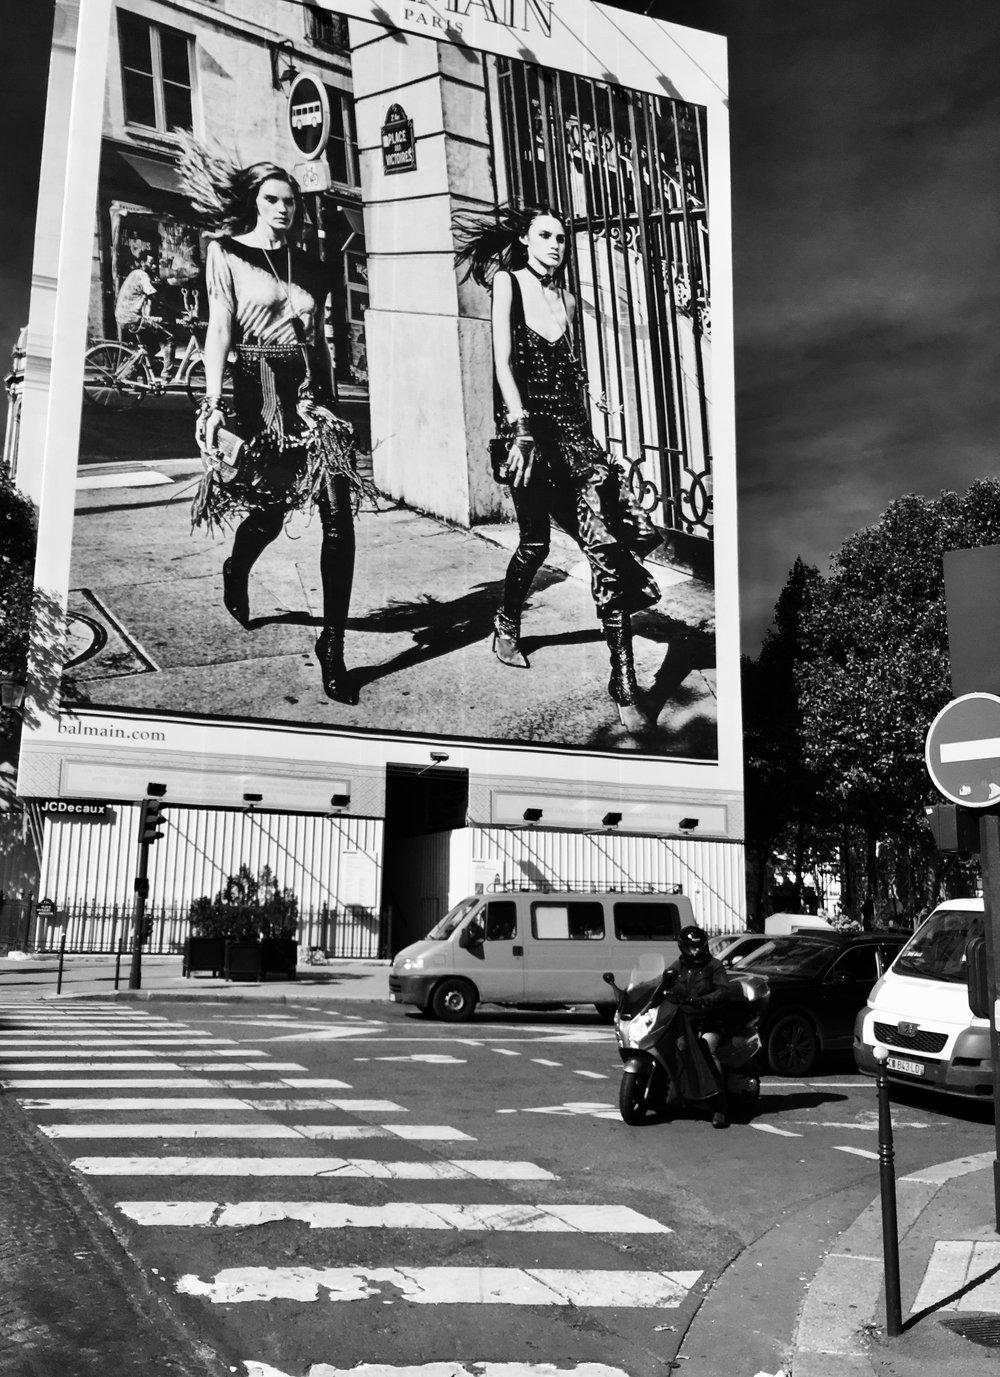 Tom_Oliver_Payne_London_to_Paris_Cycle-33.jpg